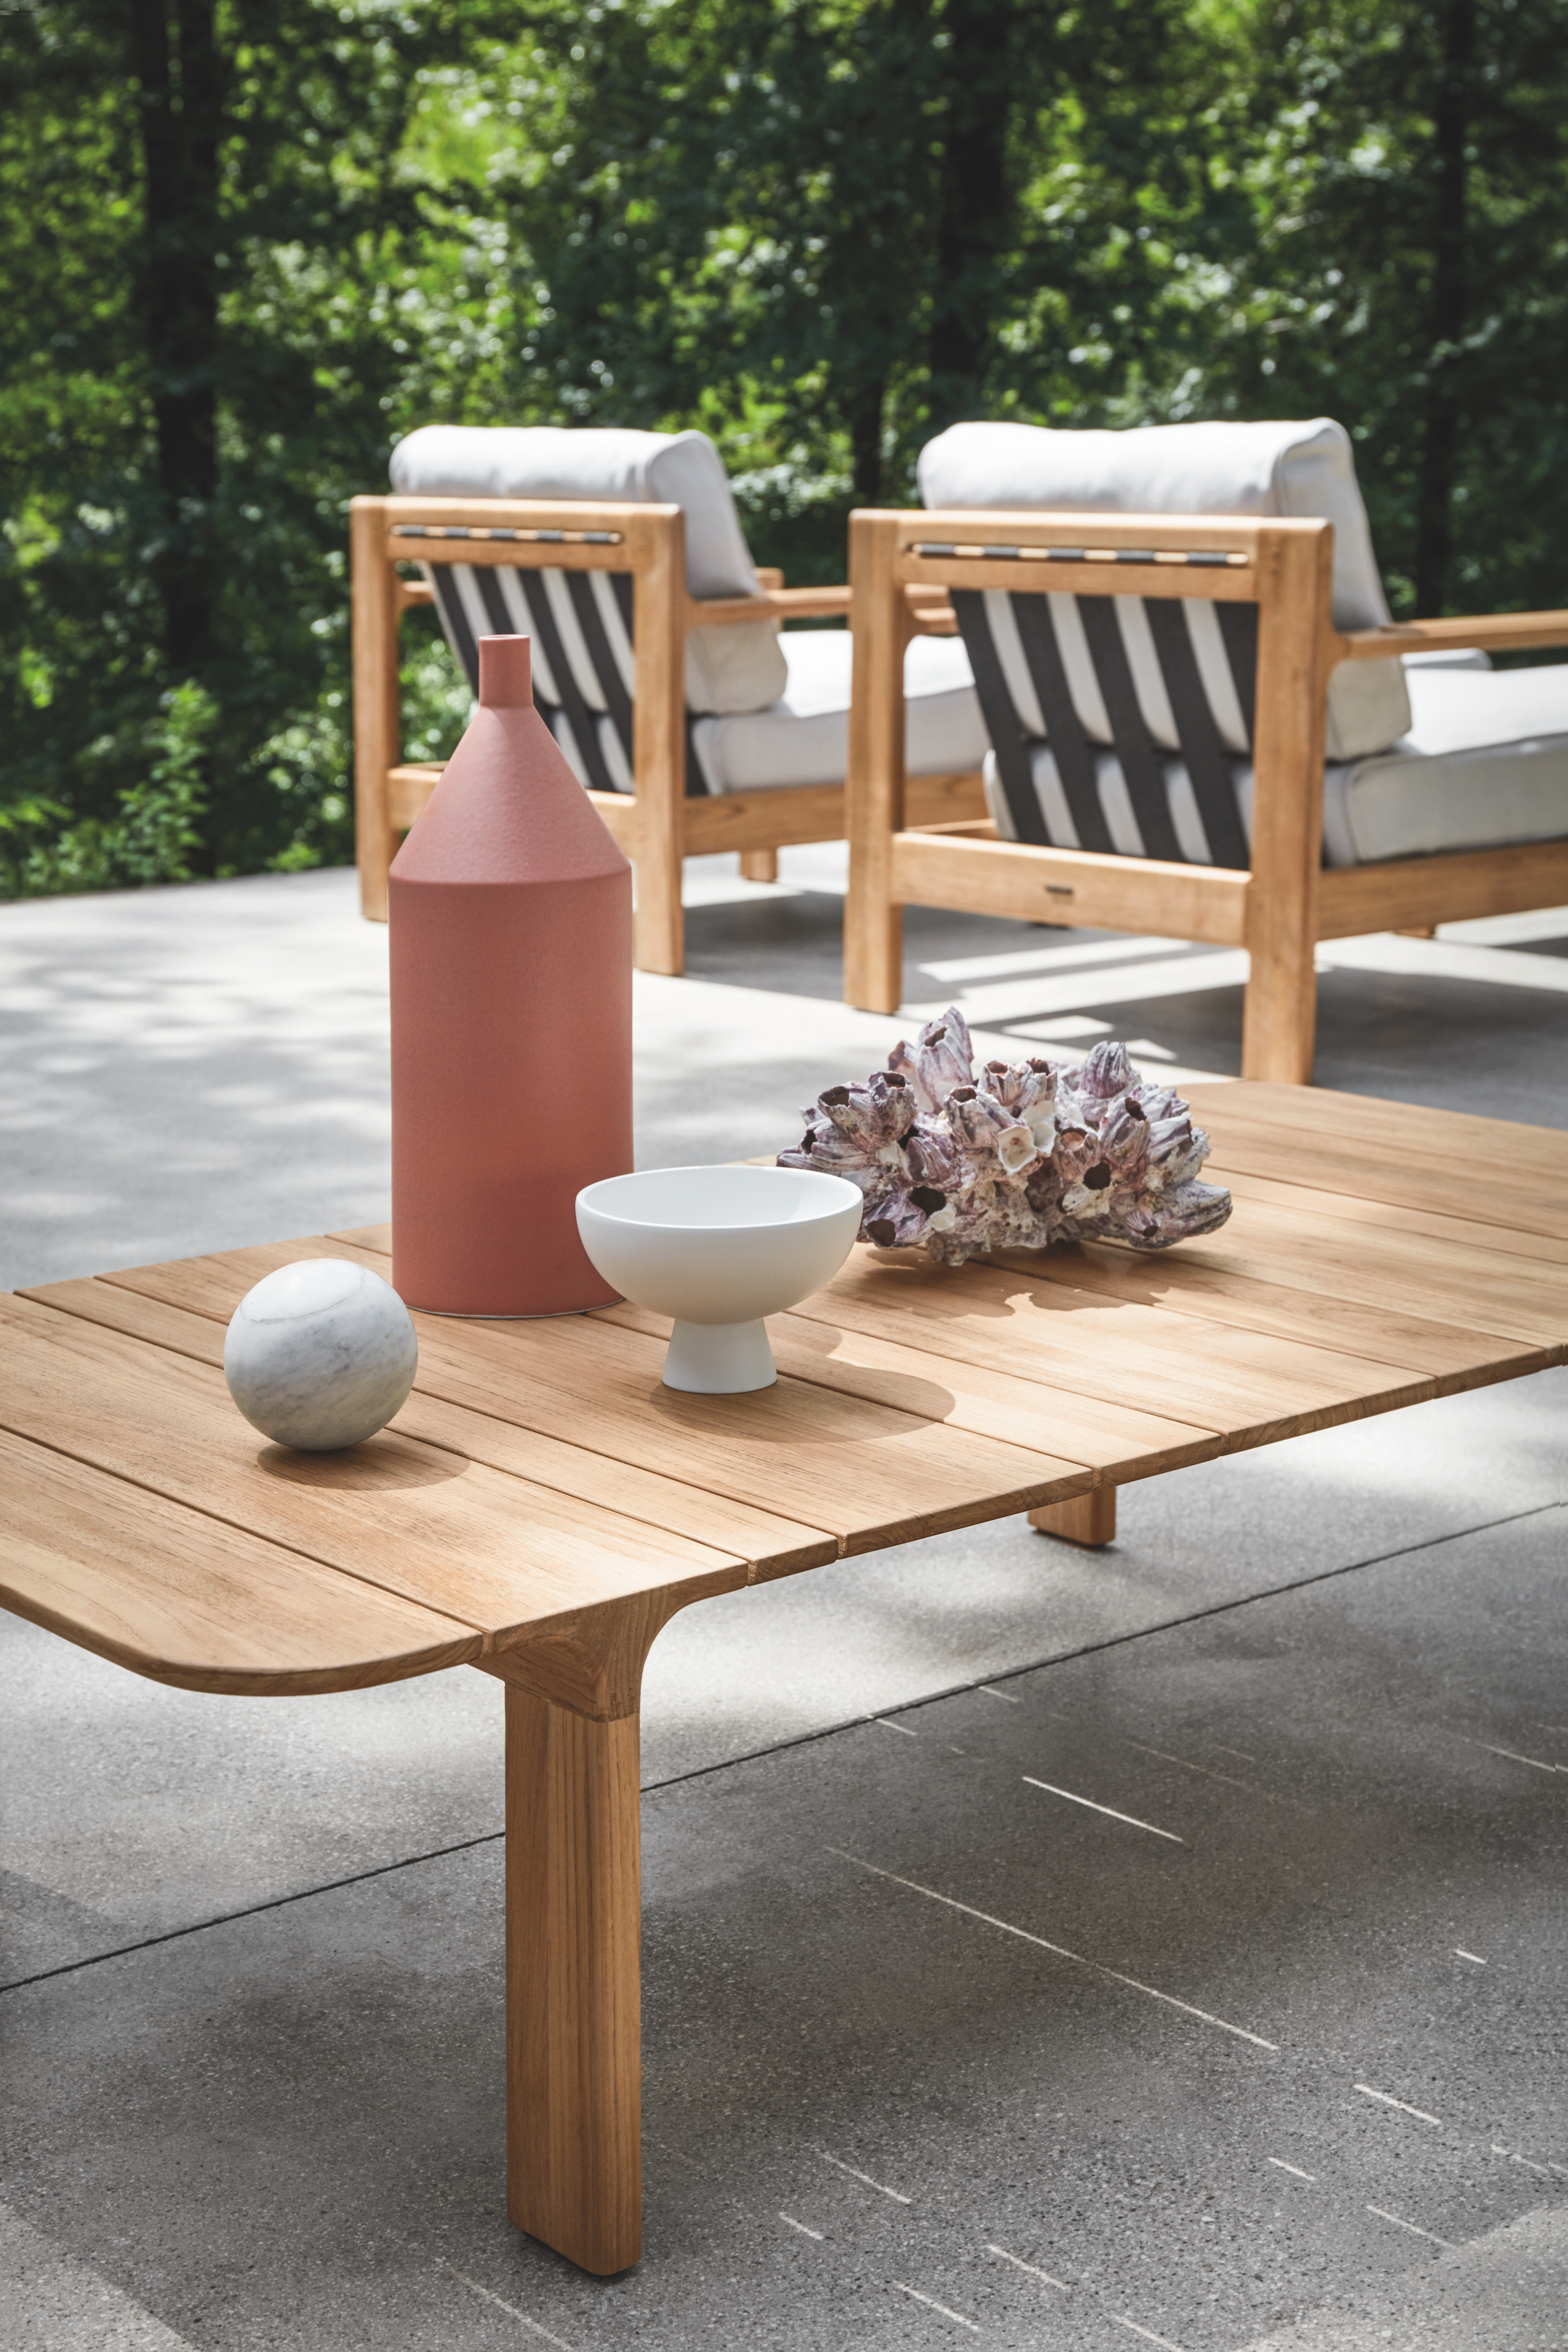 Astounding Loop Lounge Chair By Gloster Furniture Stylepark Customarchery Wood Chair Design Ideas Customarcherynet